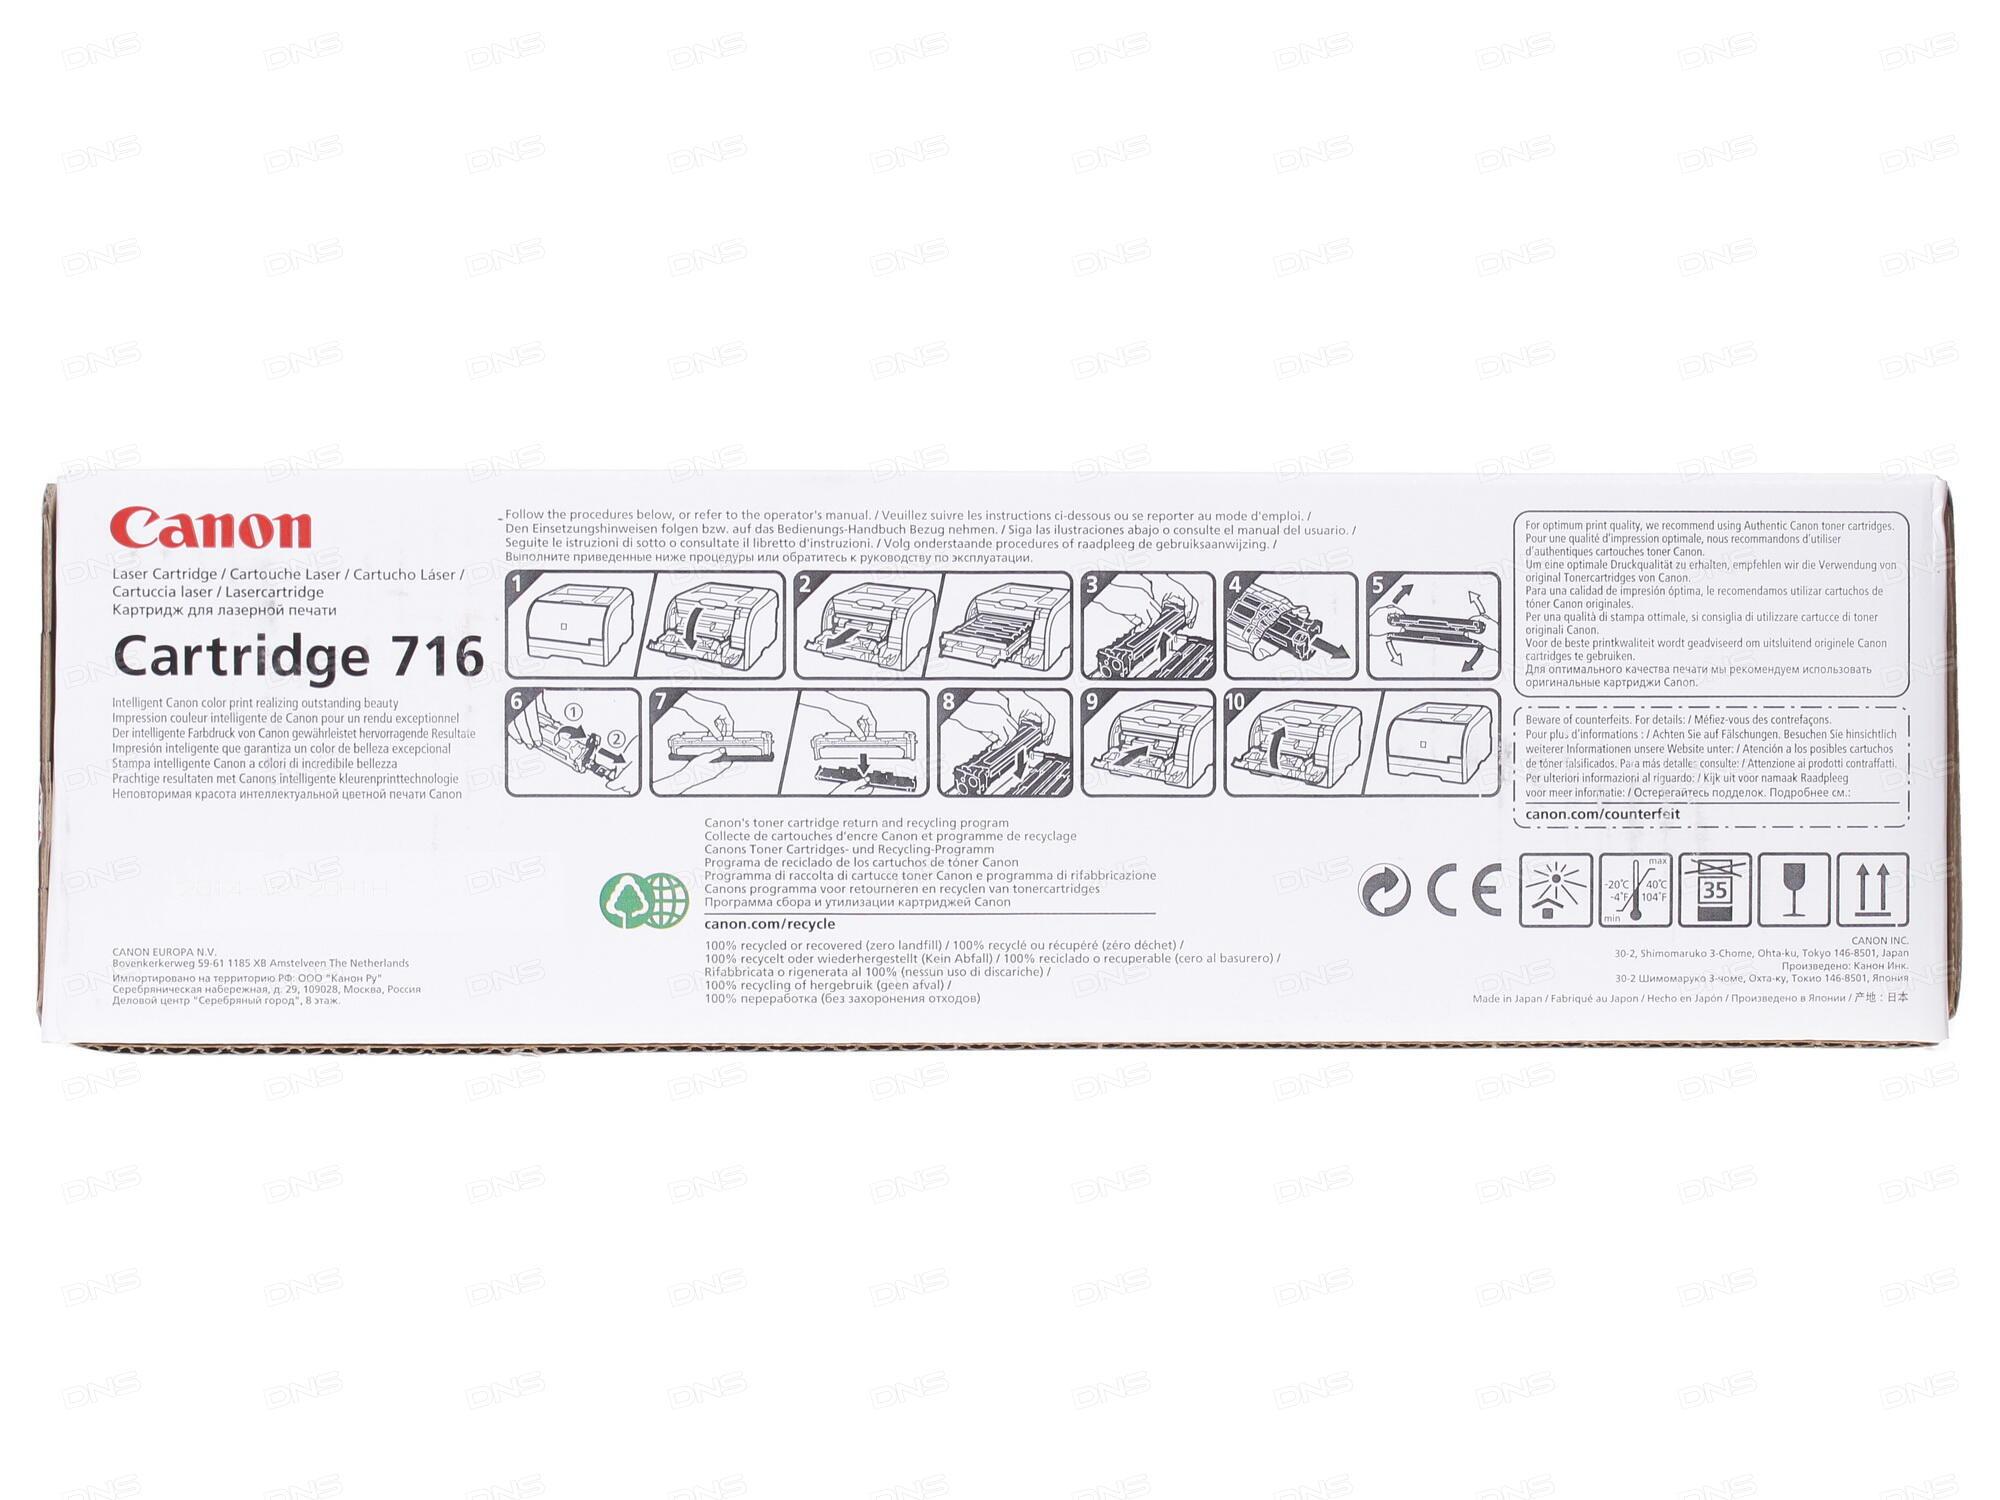 Картридж Canon 716 Y для LBP-5050 / 5050N MF8030CN / 8050CN. Жёлтый. 1500 страниц.